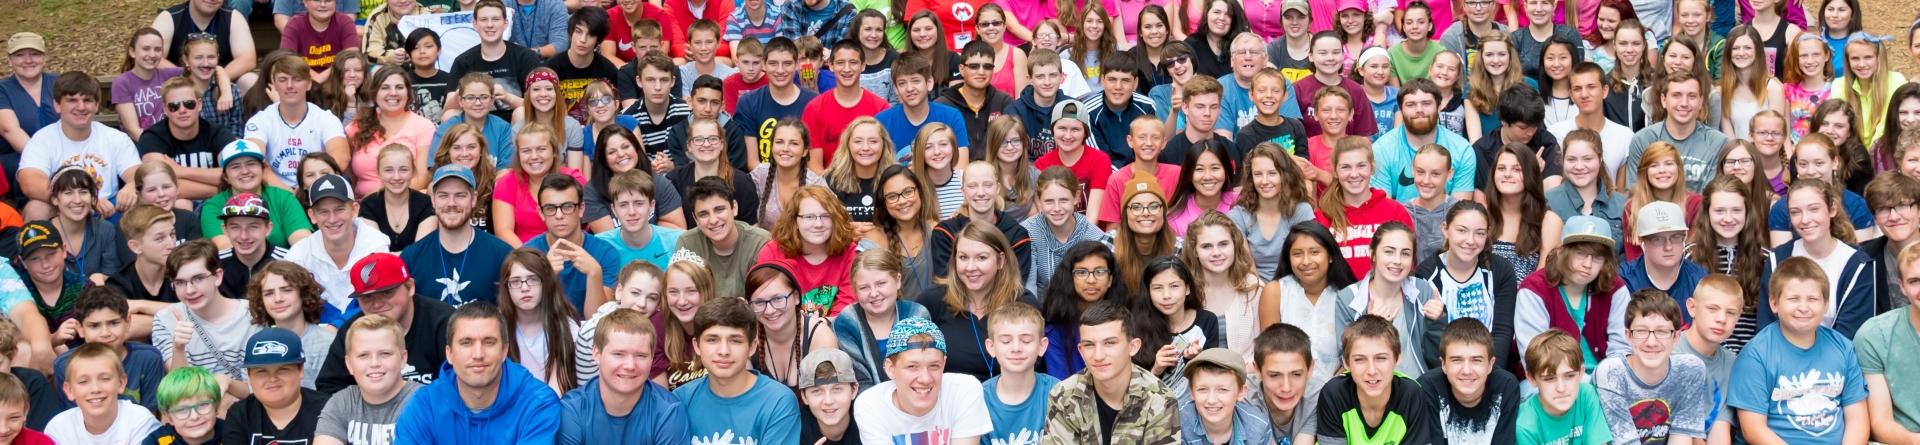 Youth_Camp_Photo_2016.jpg